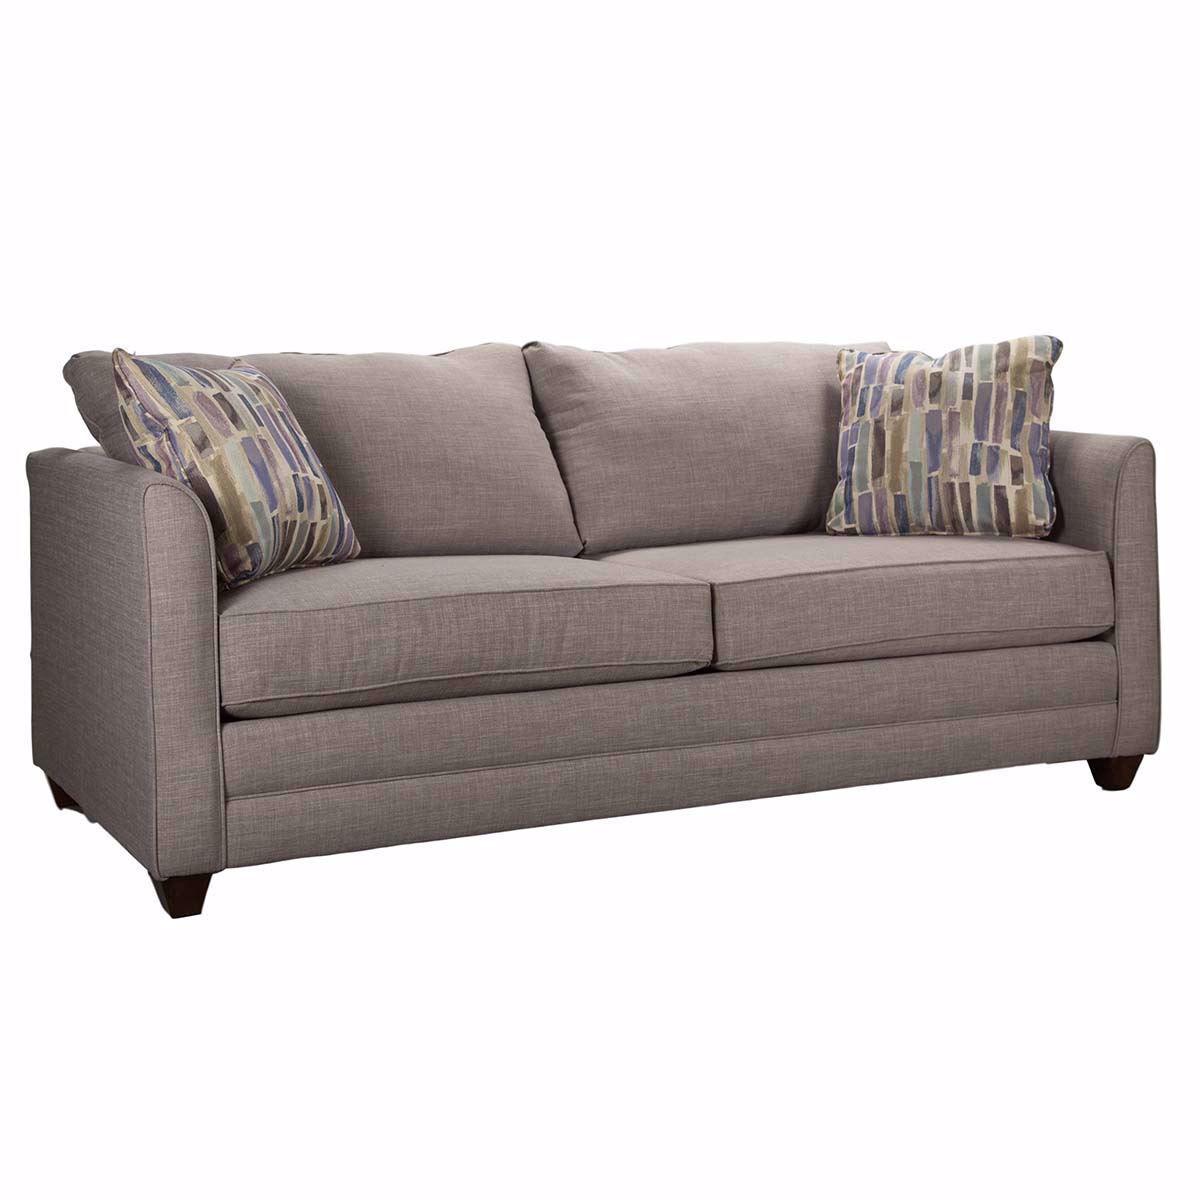 Picture of Cali Queen Sleeper Sofa